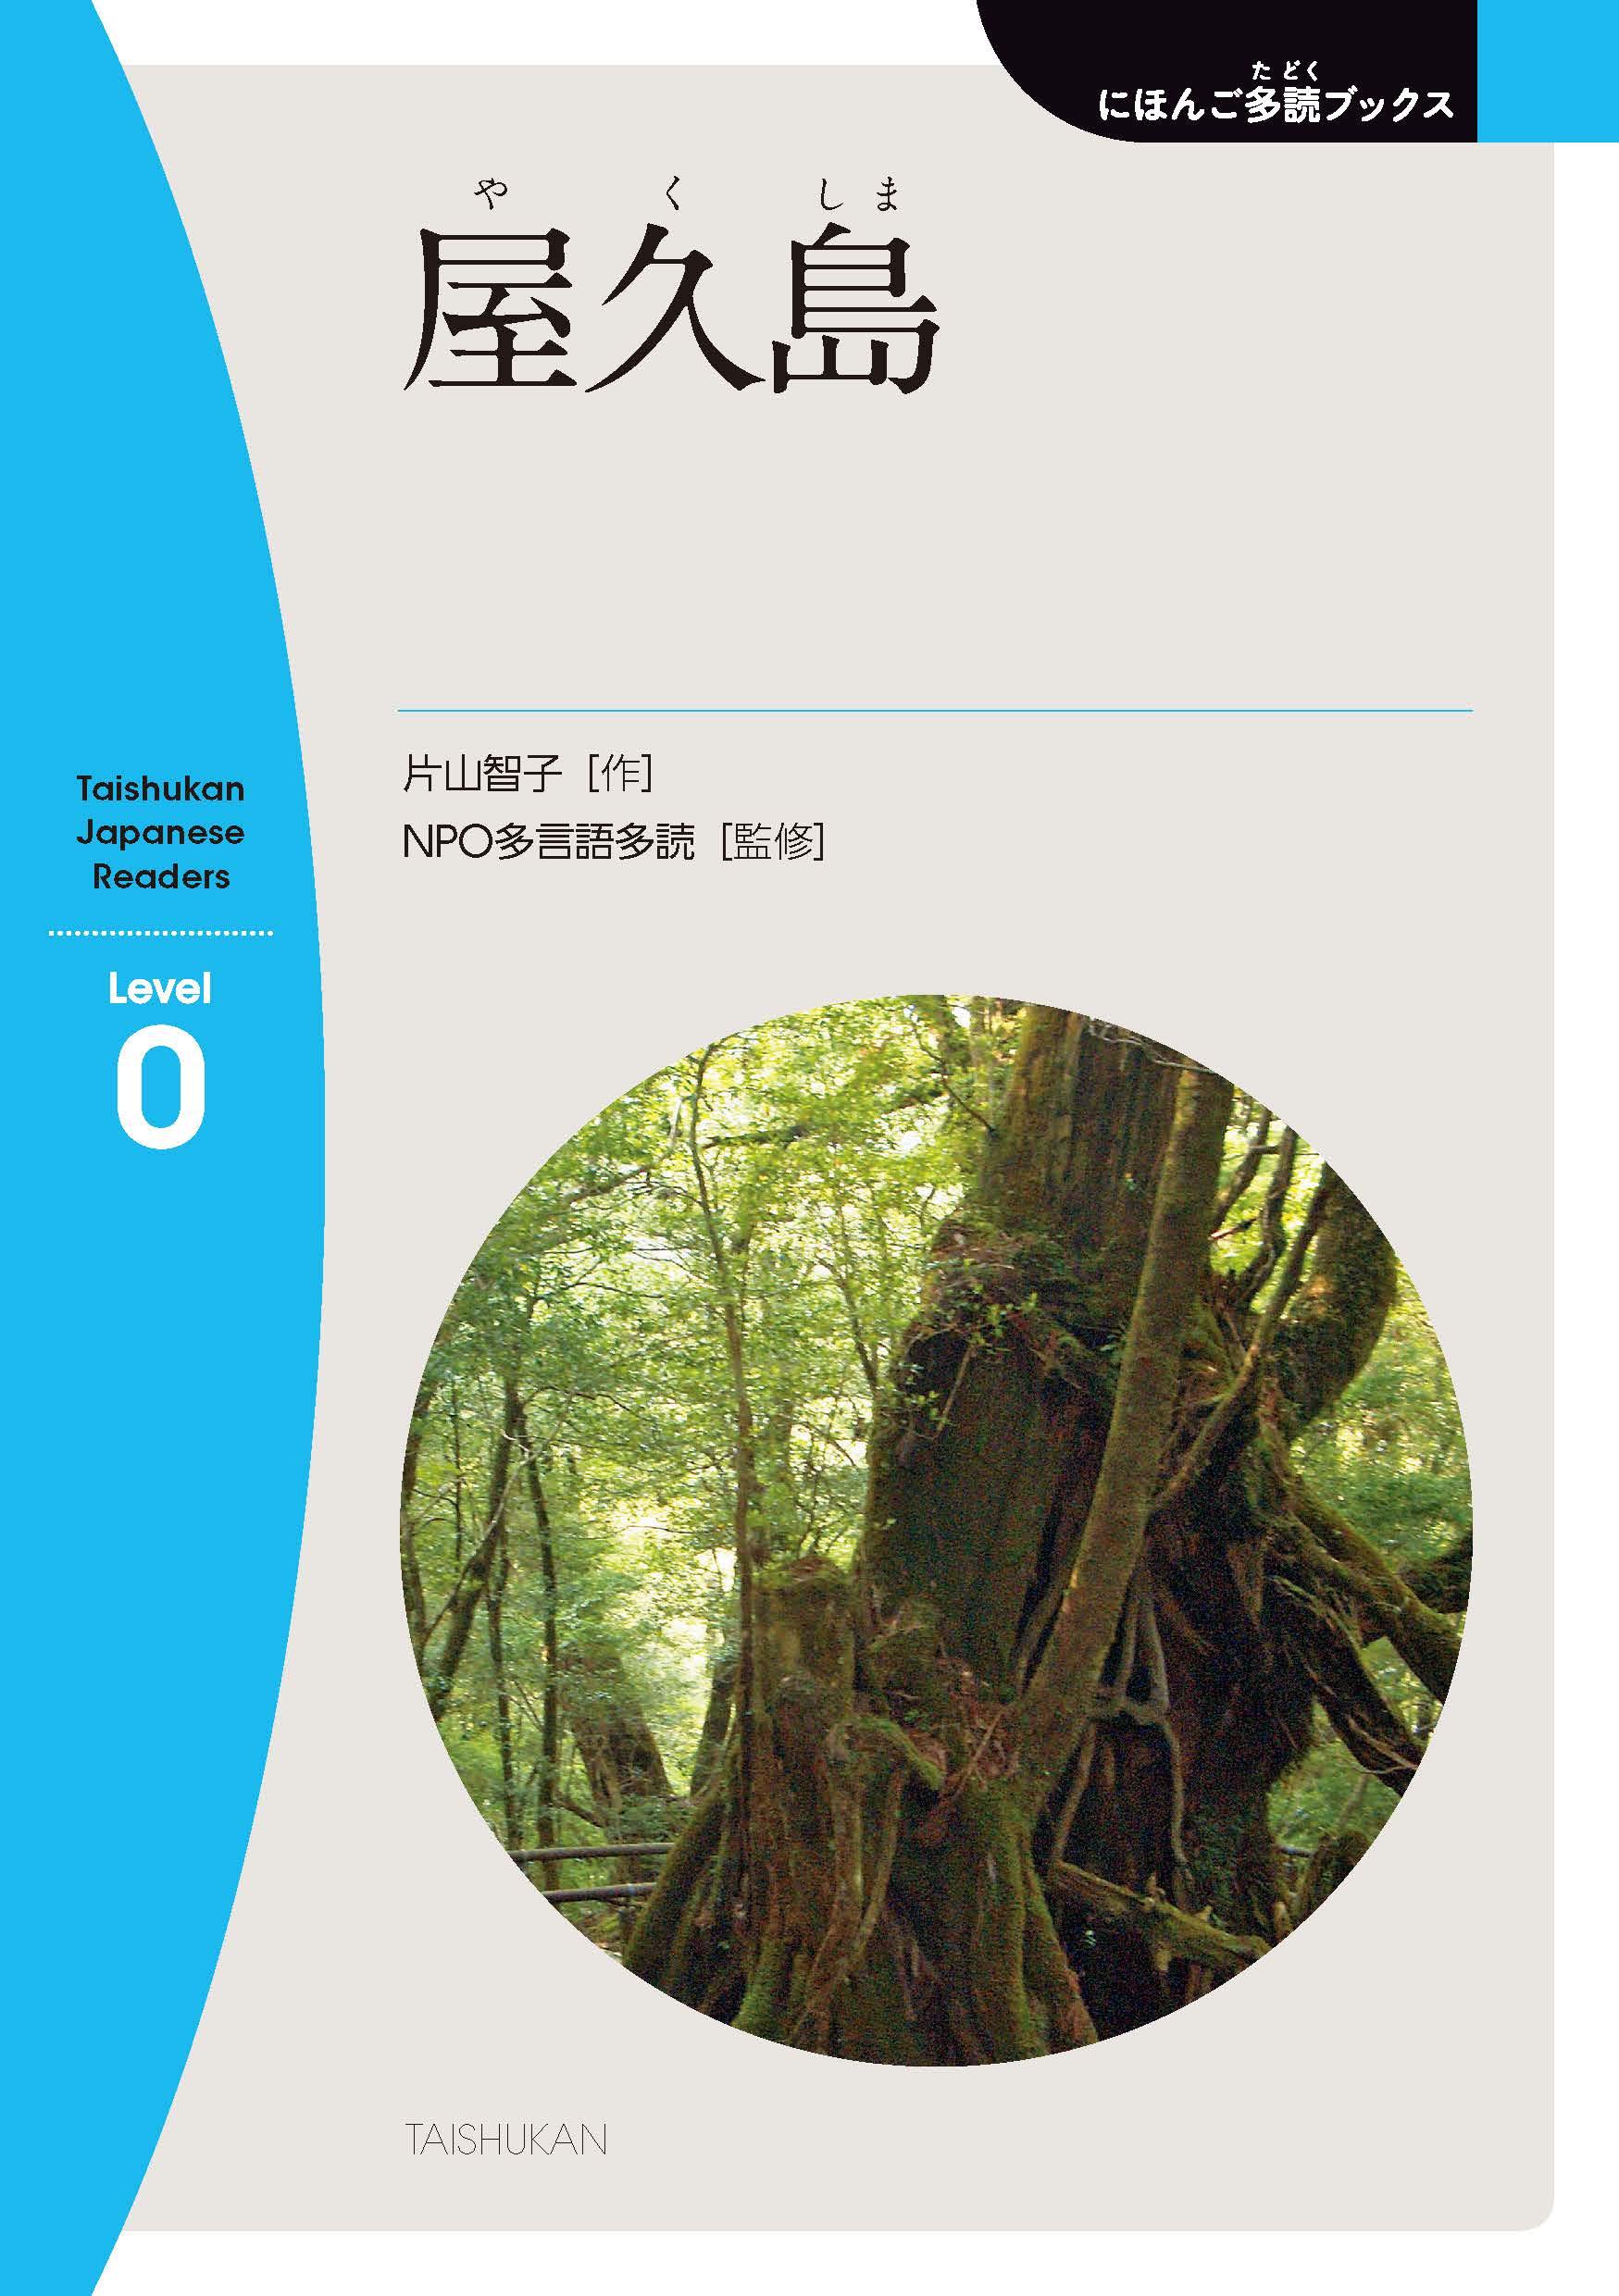 vol.1-2 屋久島(やくしま) Yakushima